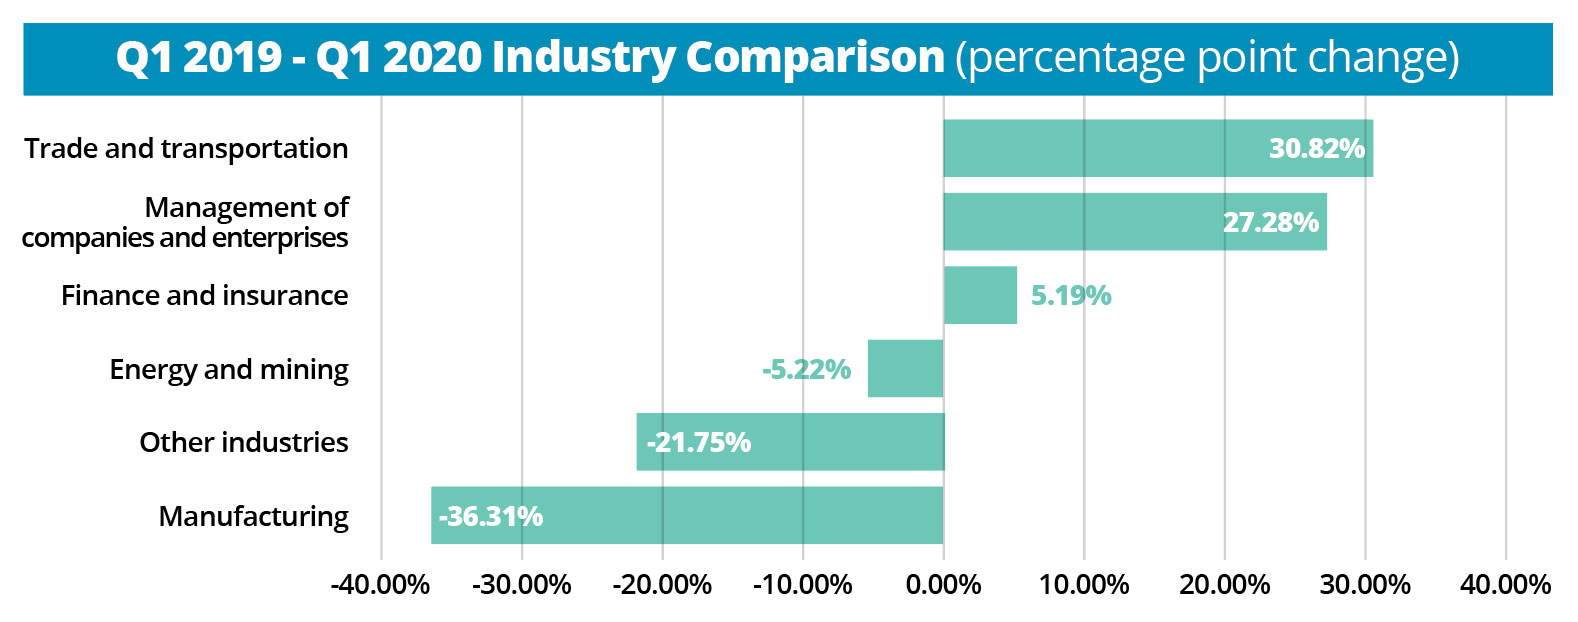 Q1 2019-Q1 2020 FDI industry comparison